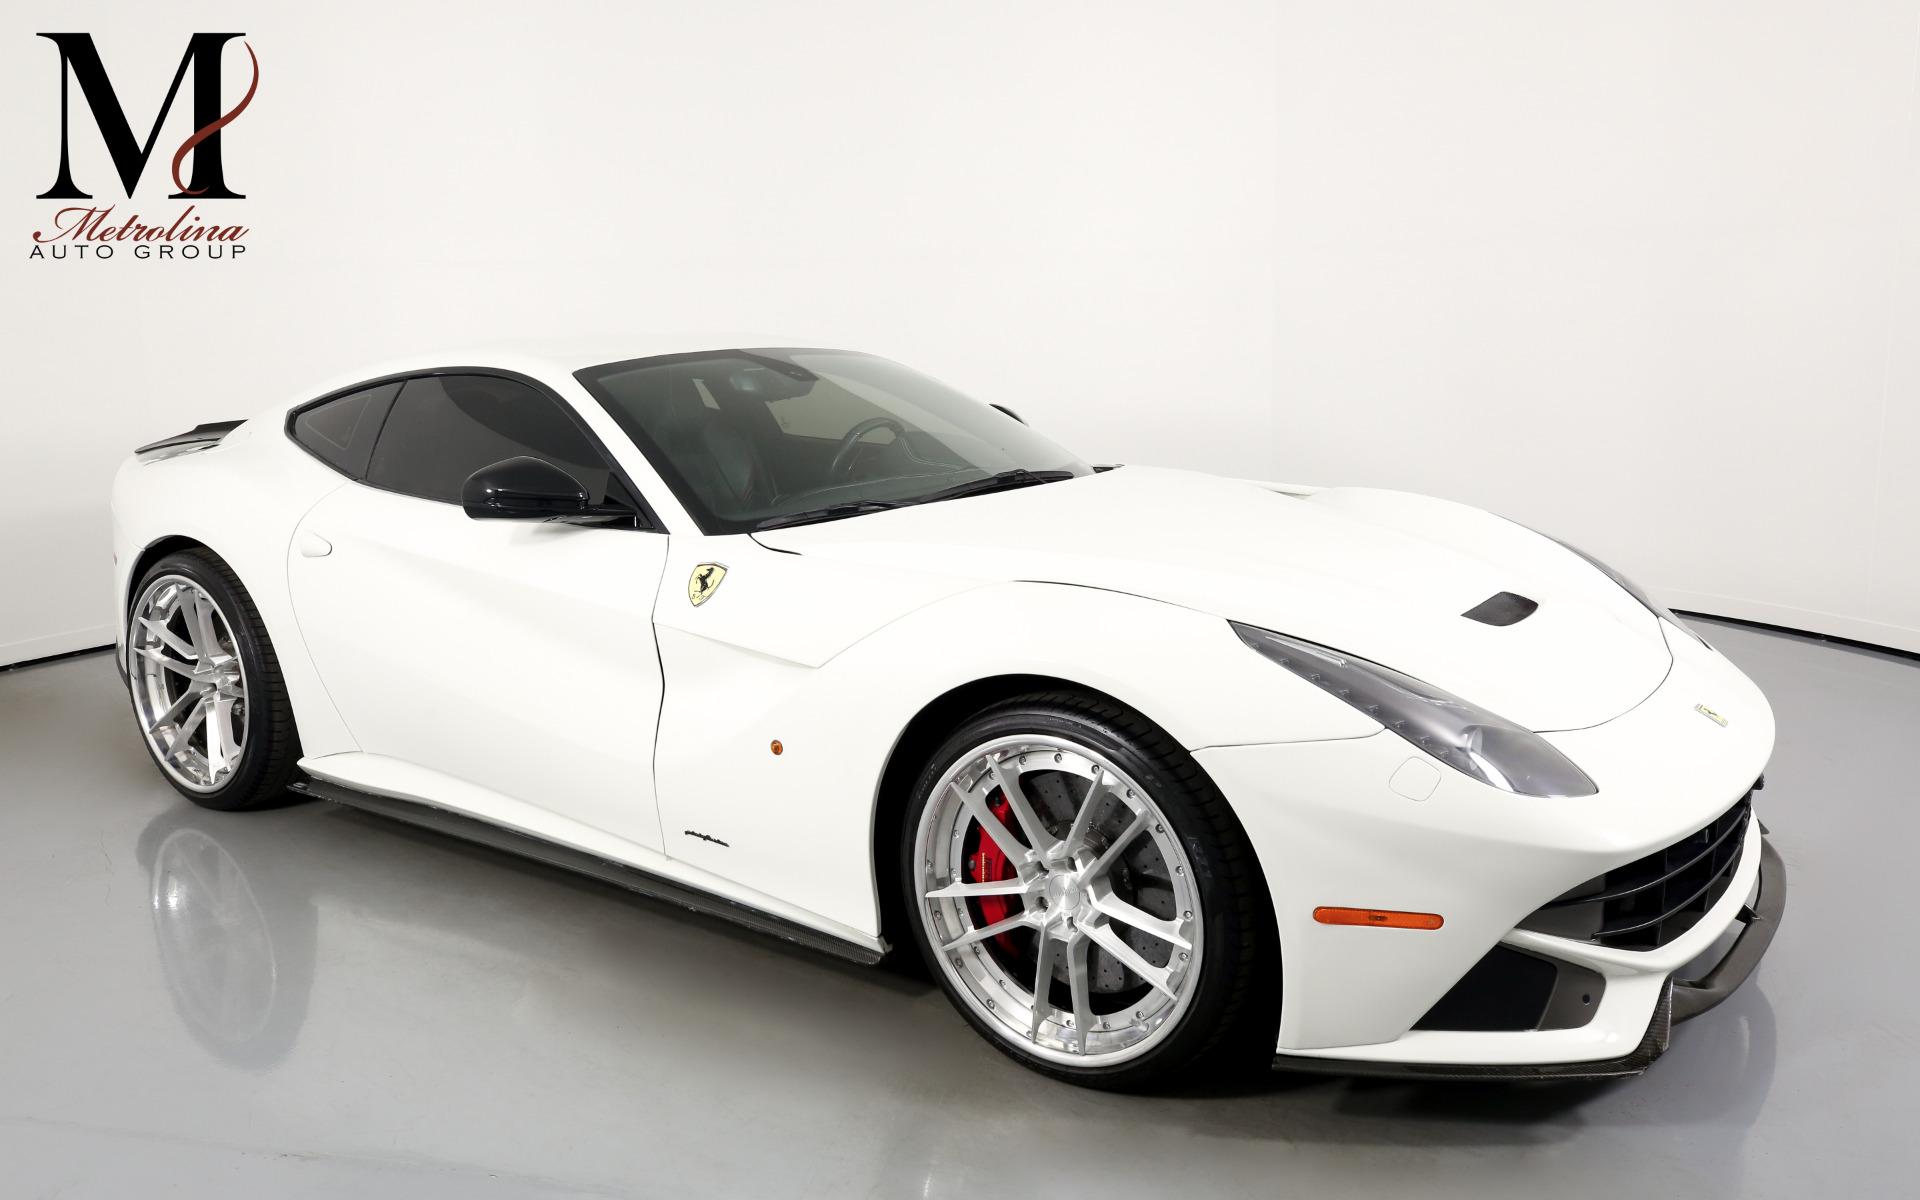 Used 2013 Ferrari F12berlinetta for sale $194,996 at Metrolina Auto Group in Charlotte NC 28217 - 1